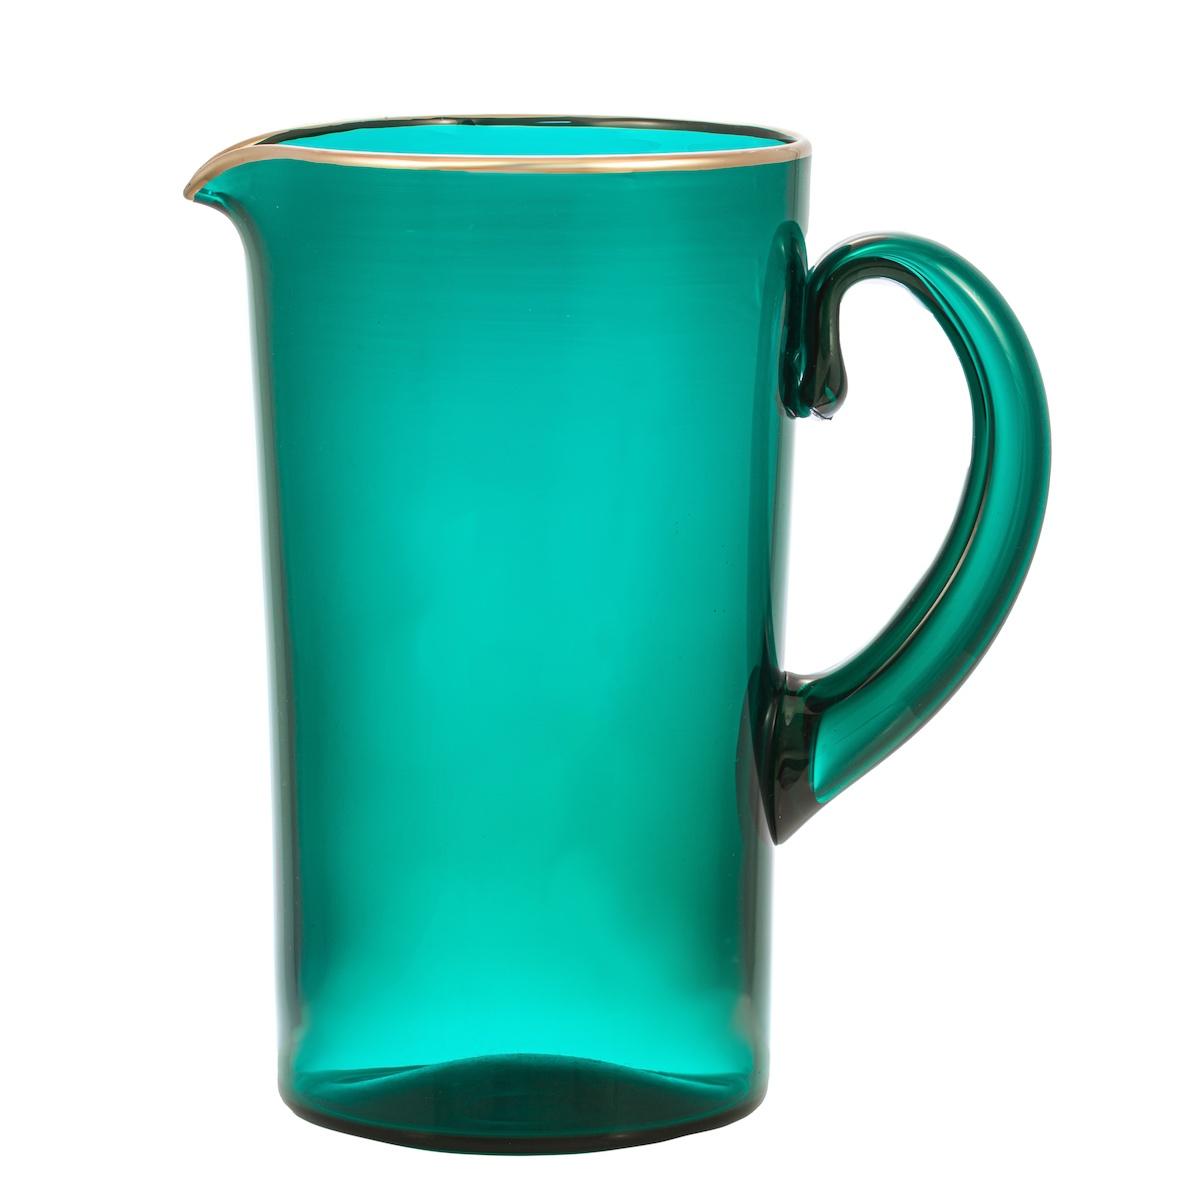 lola-viola-jug-decanter-cylindrical-handmade-lux-luxury